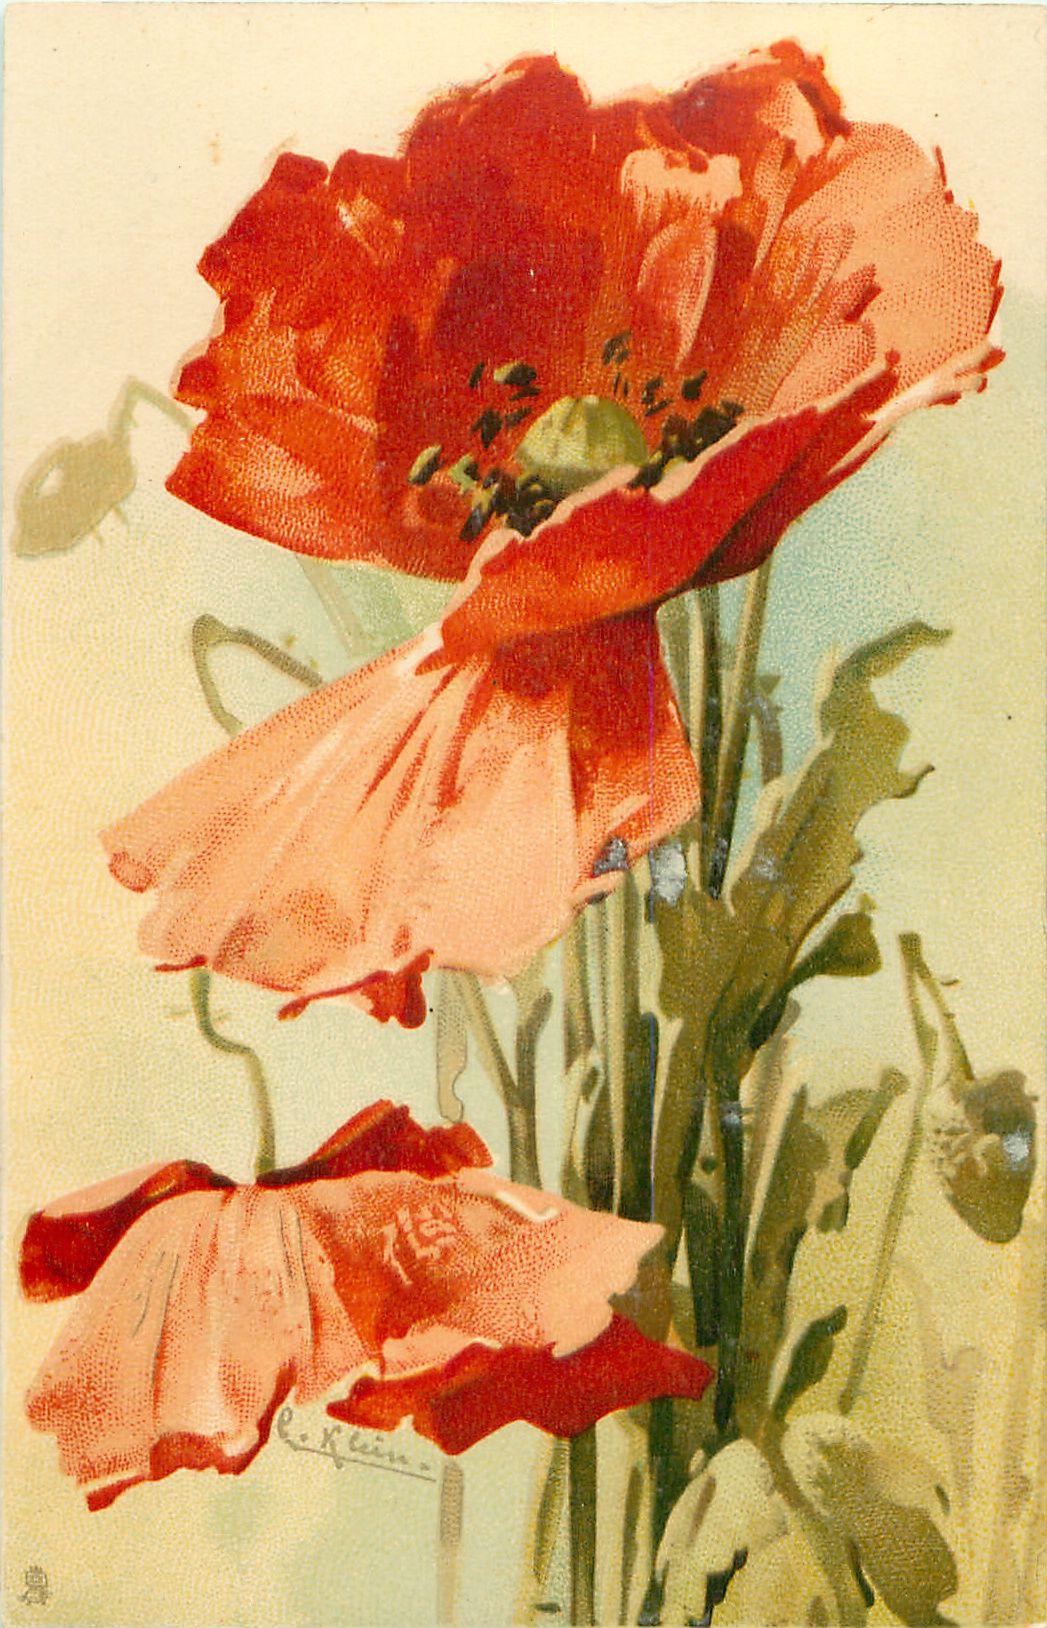 two poppies, one hangs its head, stalks vertical